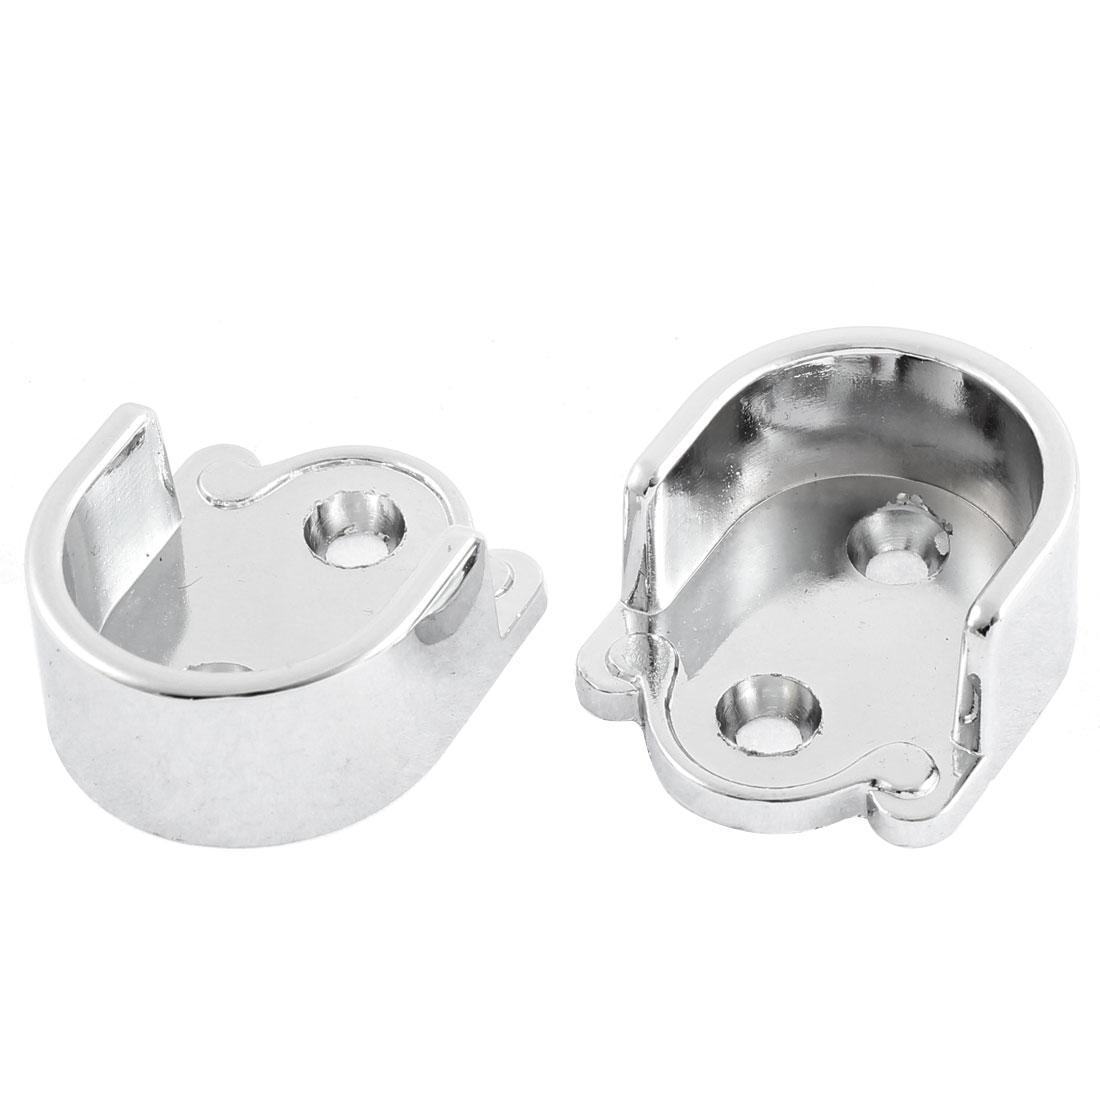 Metal 25mm Dia Clothes Closet Rod Flange Holder Bracket 2 Pcs Silver Tone